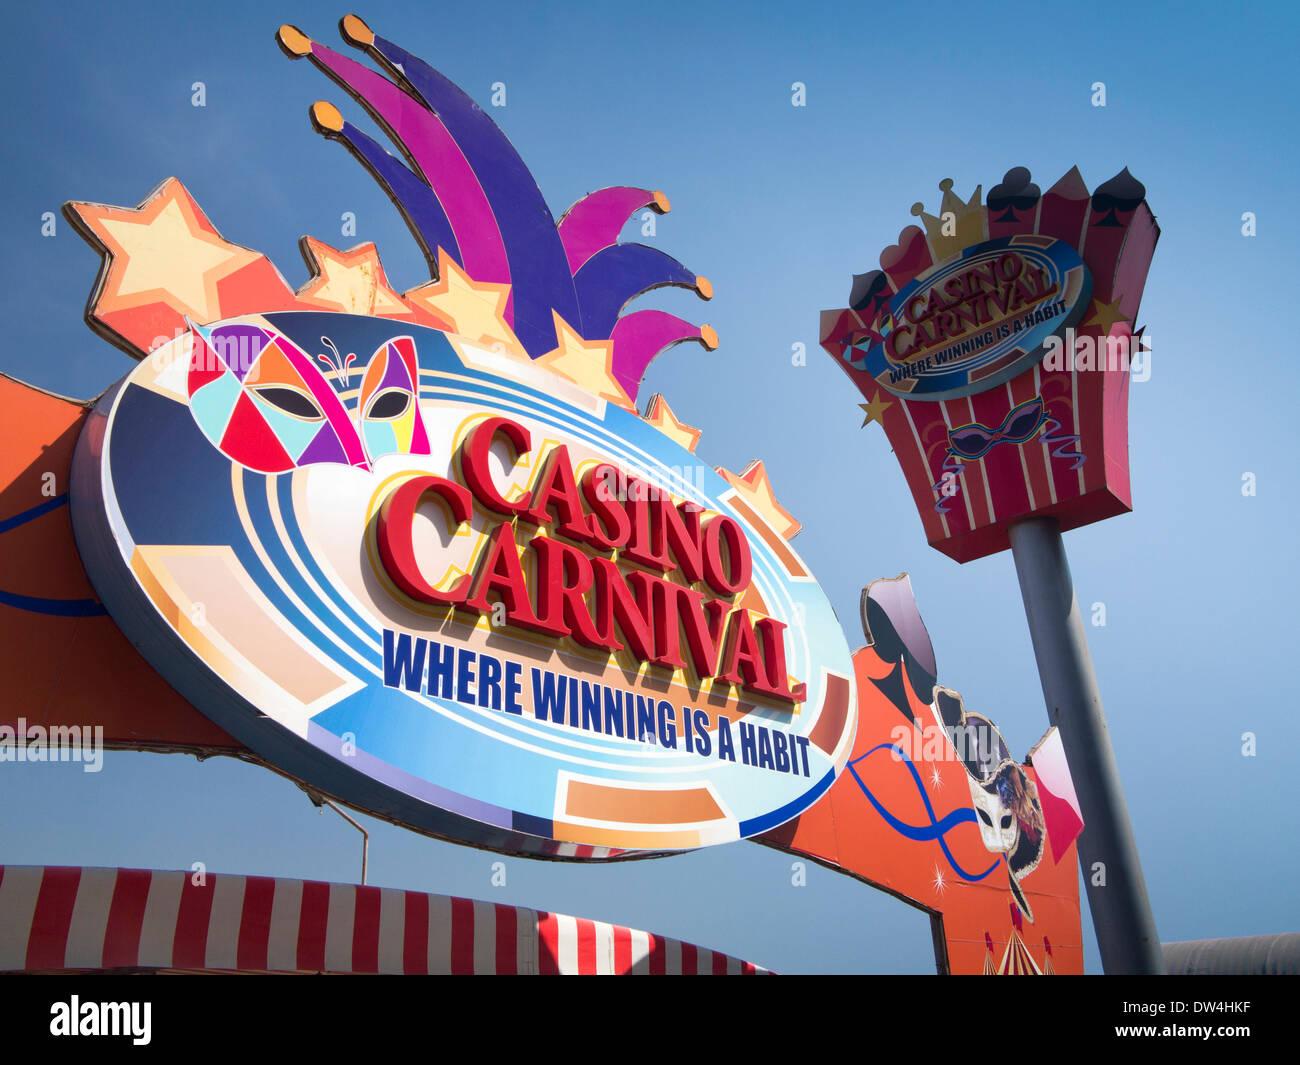 India, Goa, Panjim, gambling, Avenida Don Jao de Castro, colourful sign of Casino Carnival - Stock Image